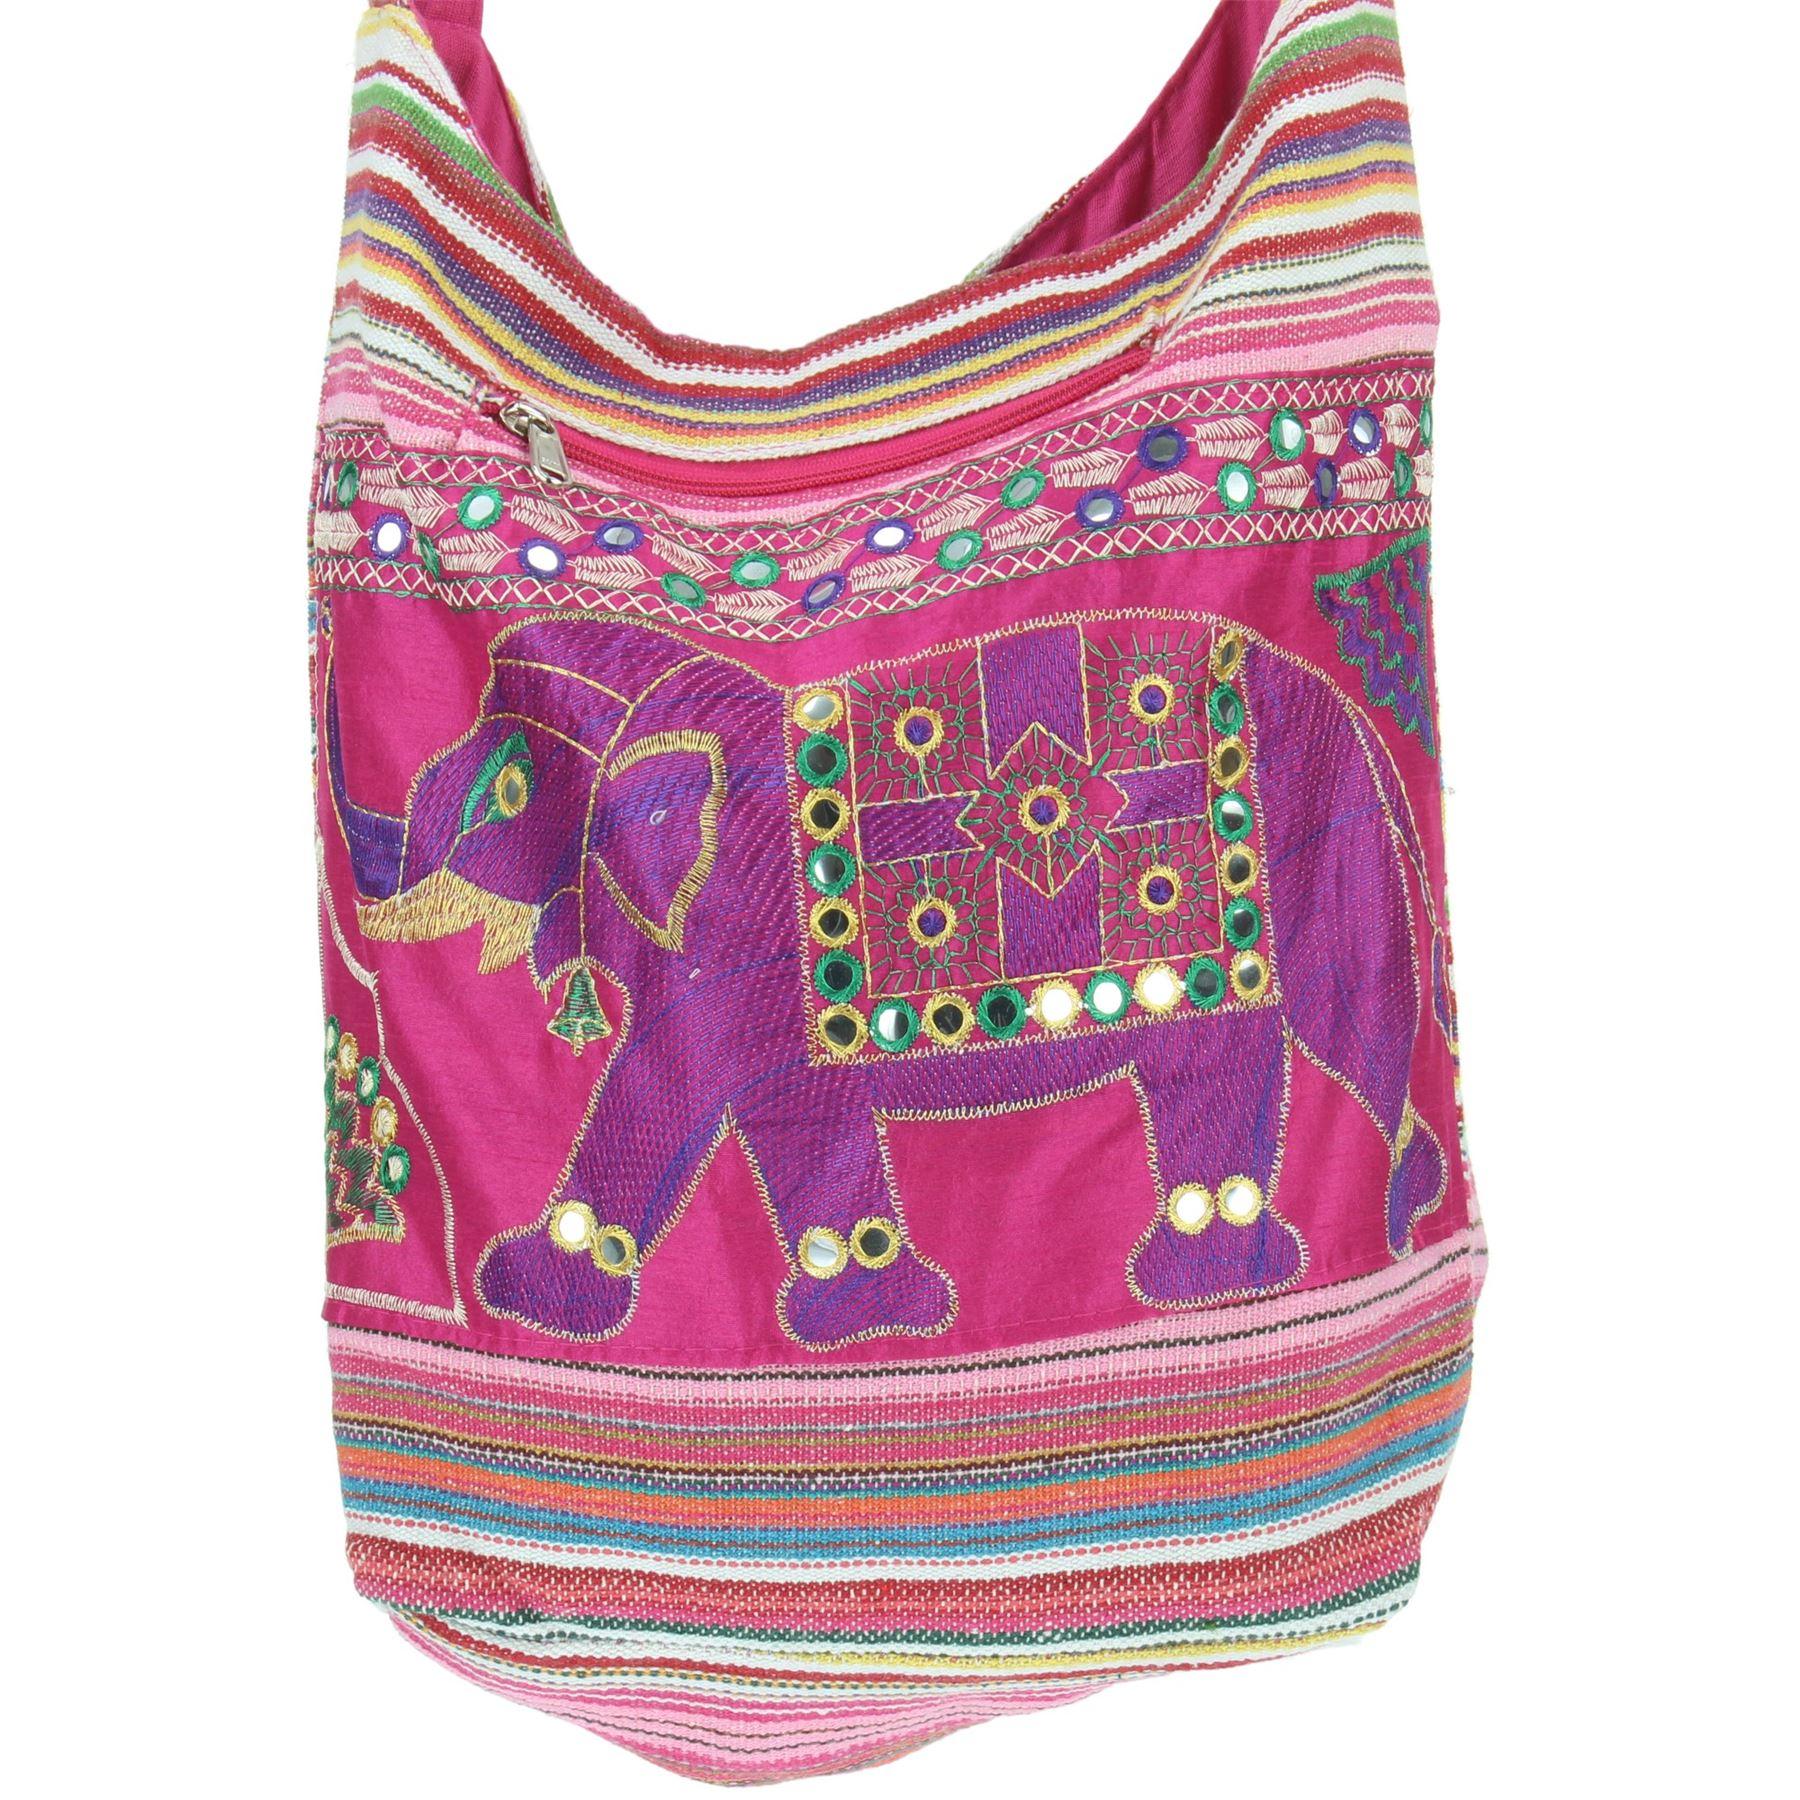 Sling-Bag-Elephant-Messenger-Crossbody-Cross-Body-Handbag-Backpack-Hippie-Hobo miniatuur 15